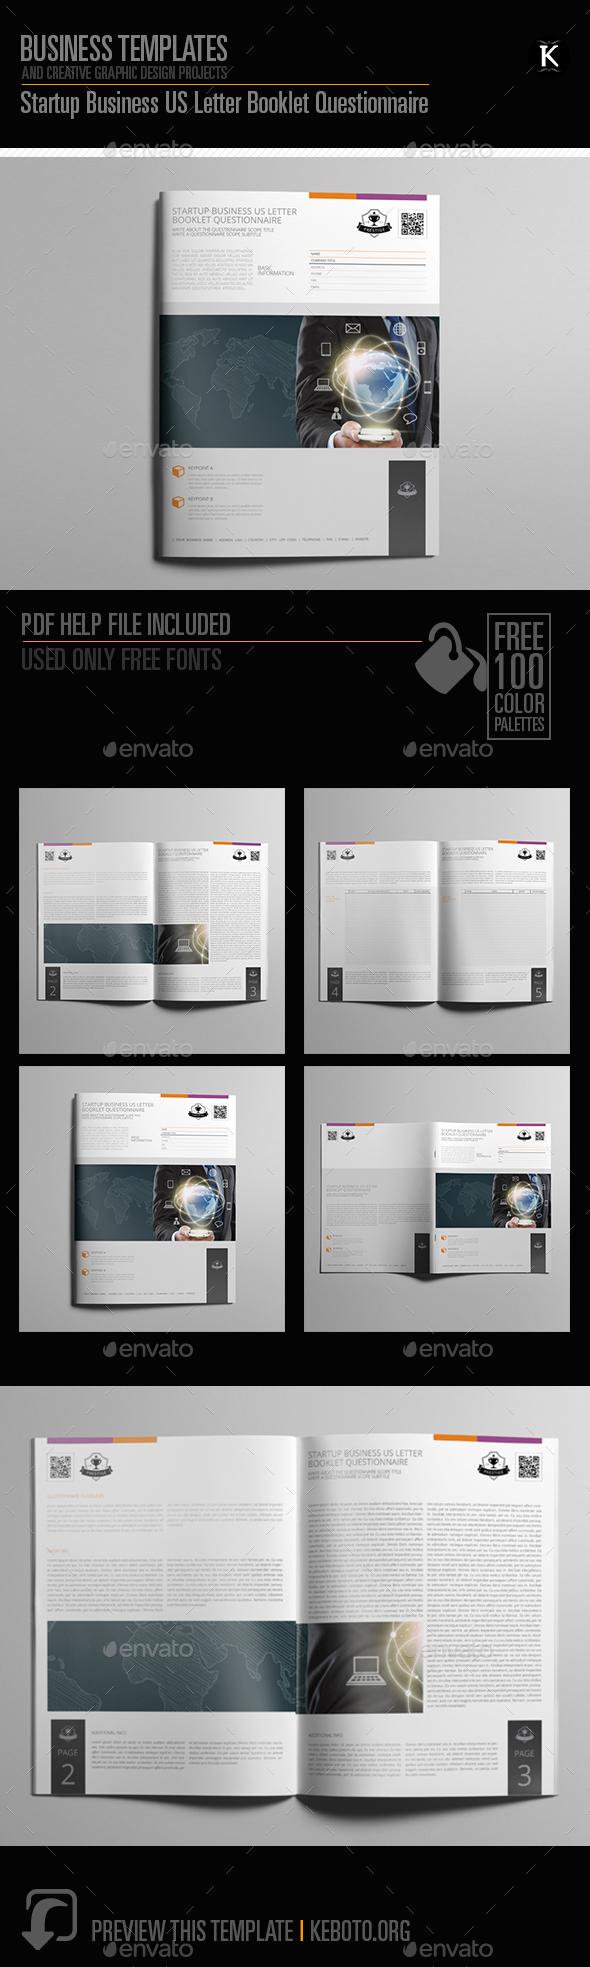 Startup Business US Letter Booklet Questionnaire - Miscellaneous Print Templates